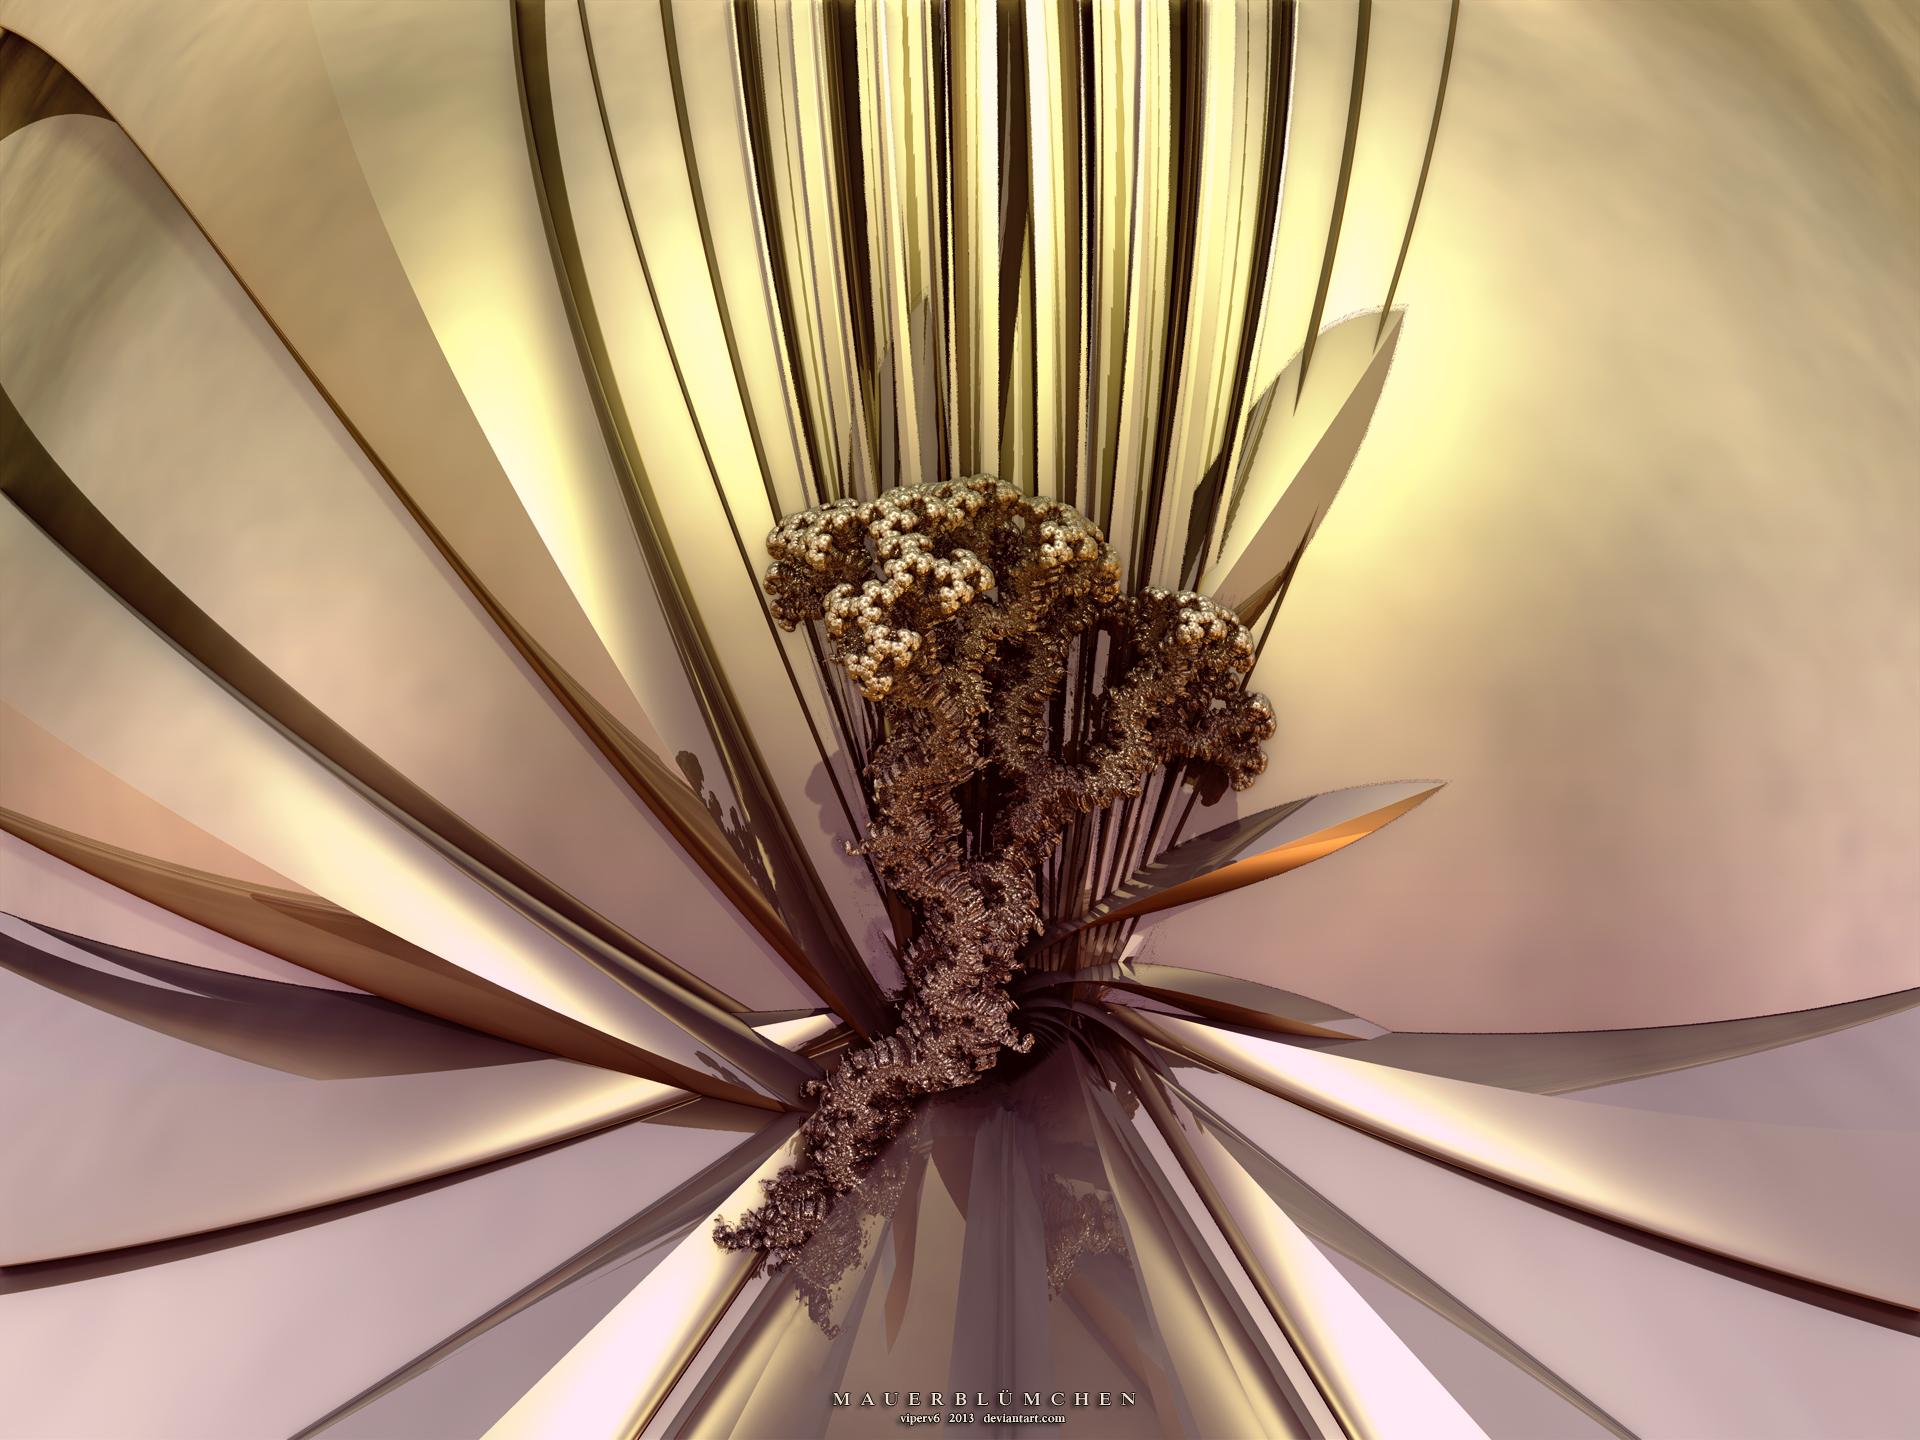 Mauerbluemchen by viperv6